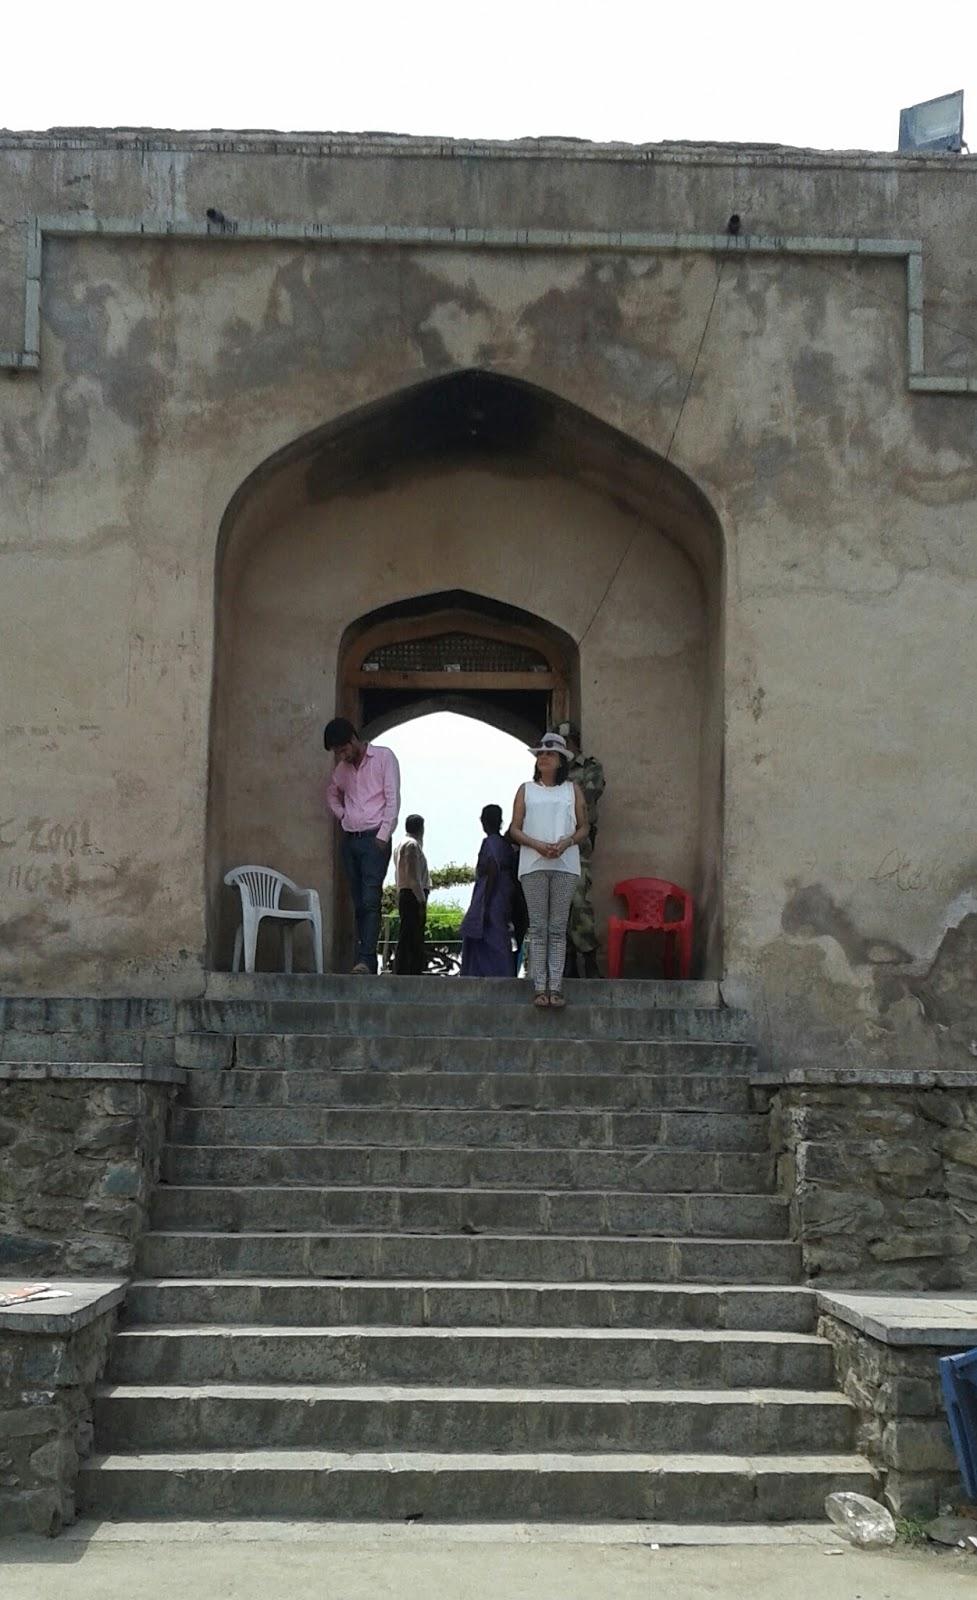 parimahal-fairiesabodesrinagarjammuandkashmir(picturesimages)-alkanarula.jpg